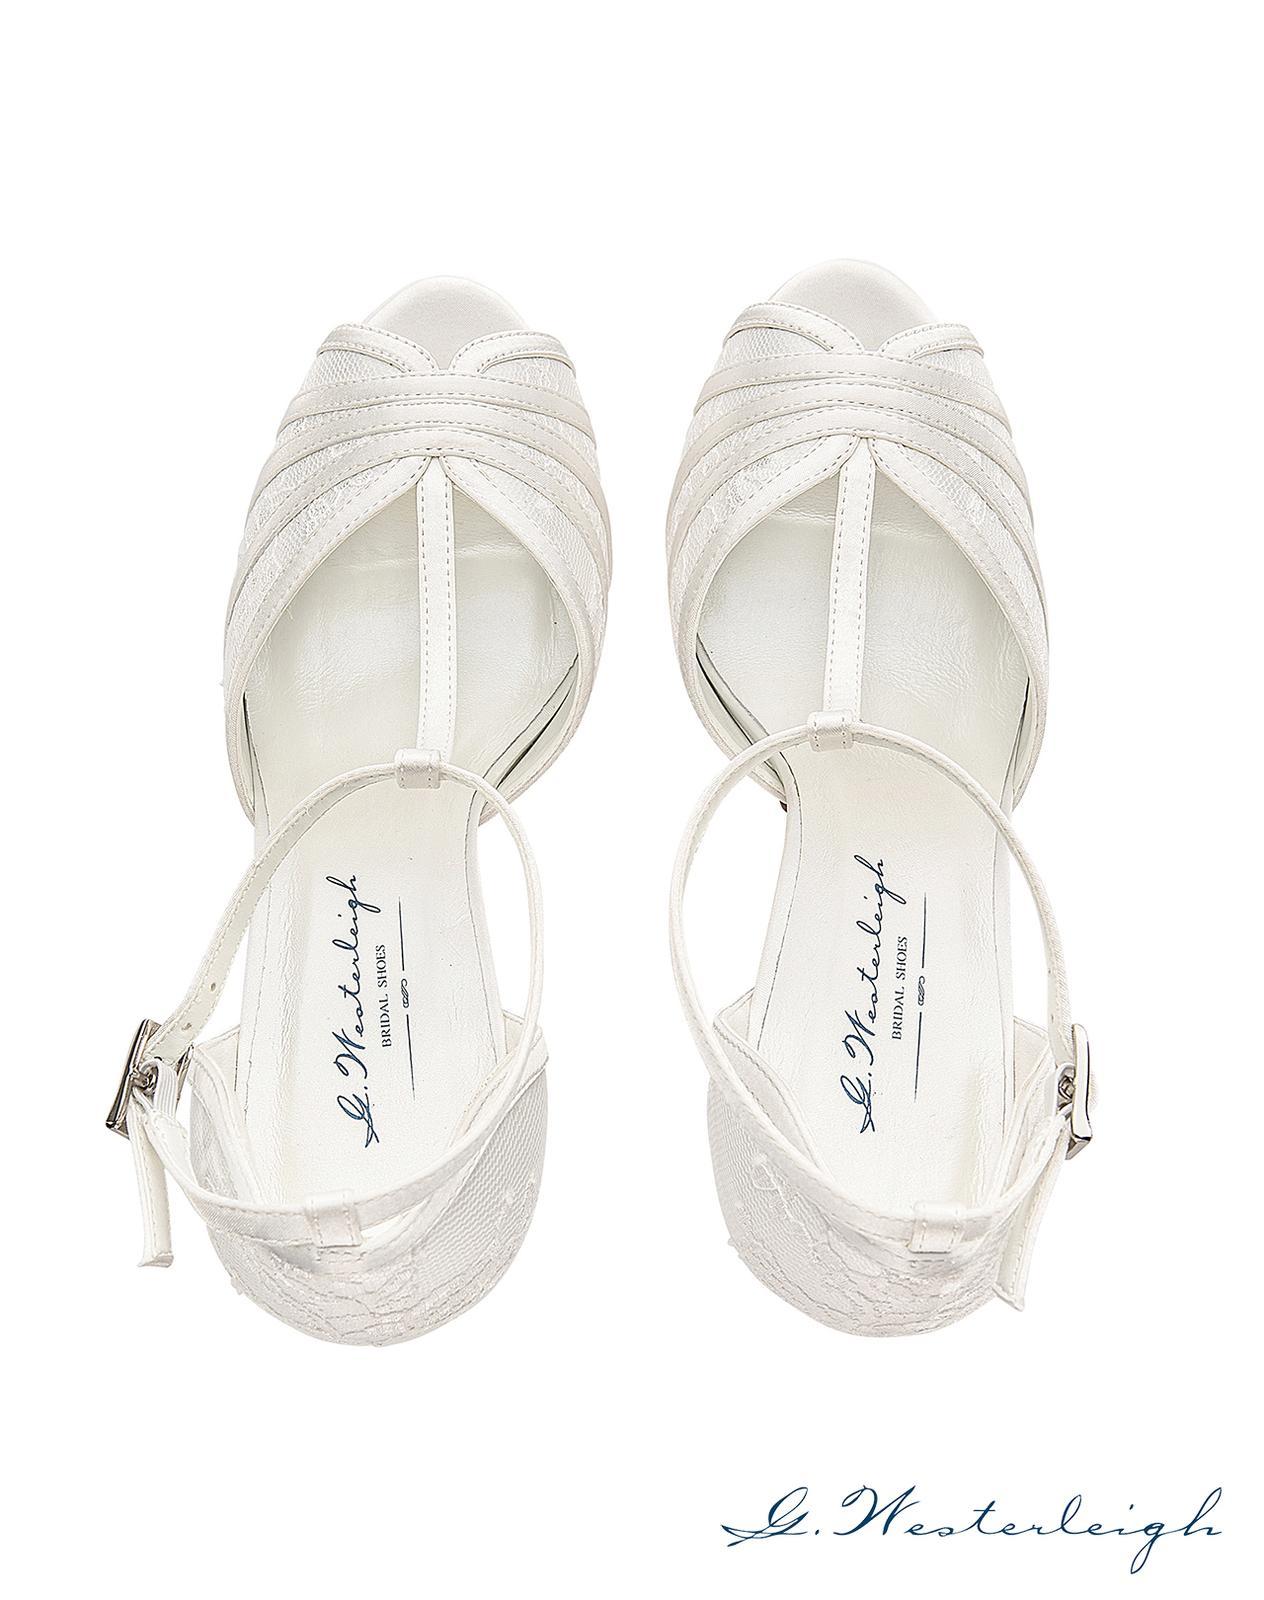 Svadobné topánky Scarlett - Obrázok č. 3